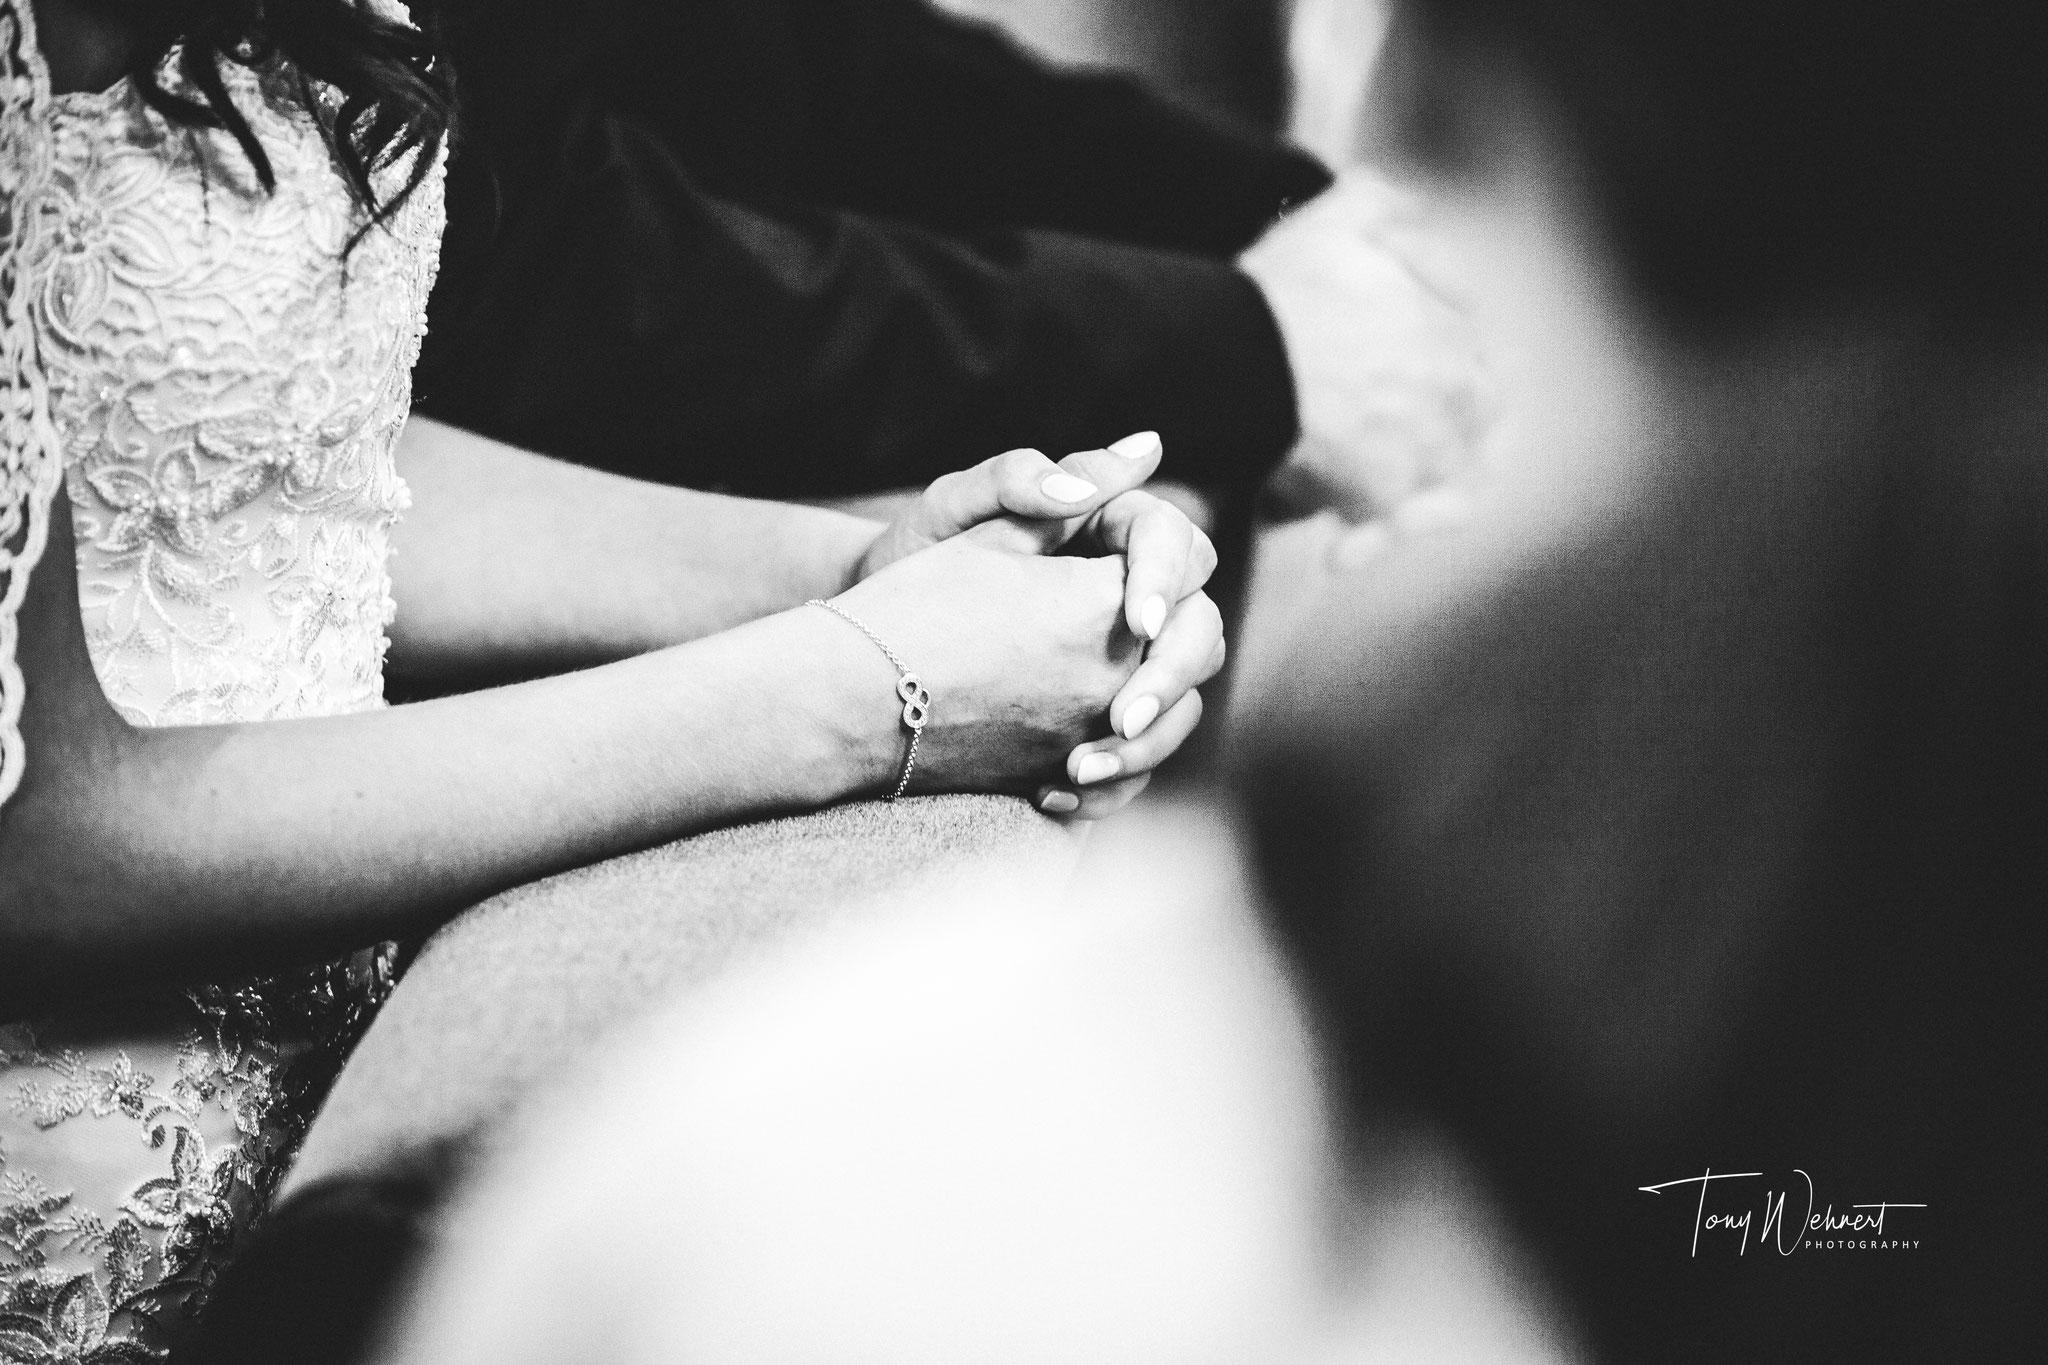 Das Brautpaar betet um den Segen